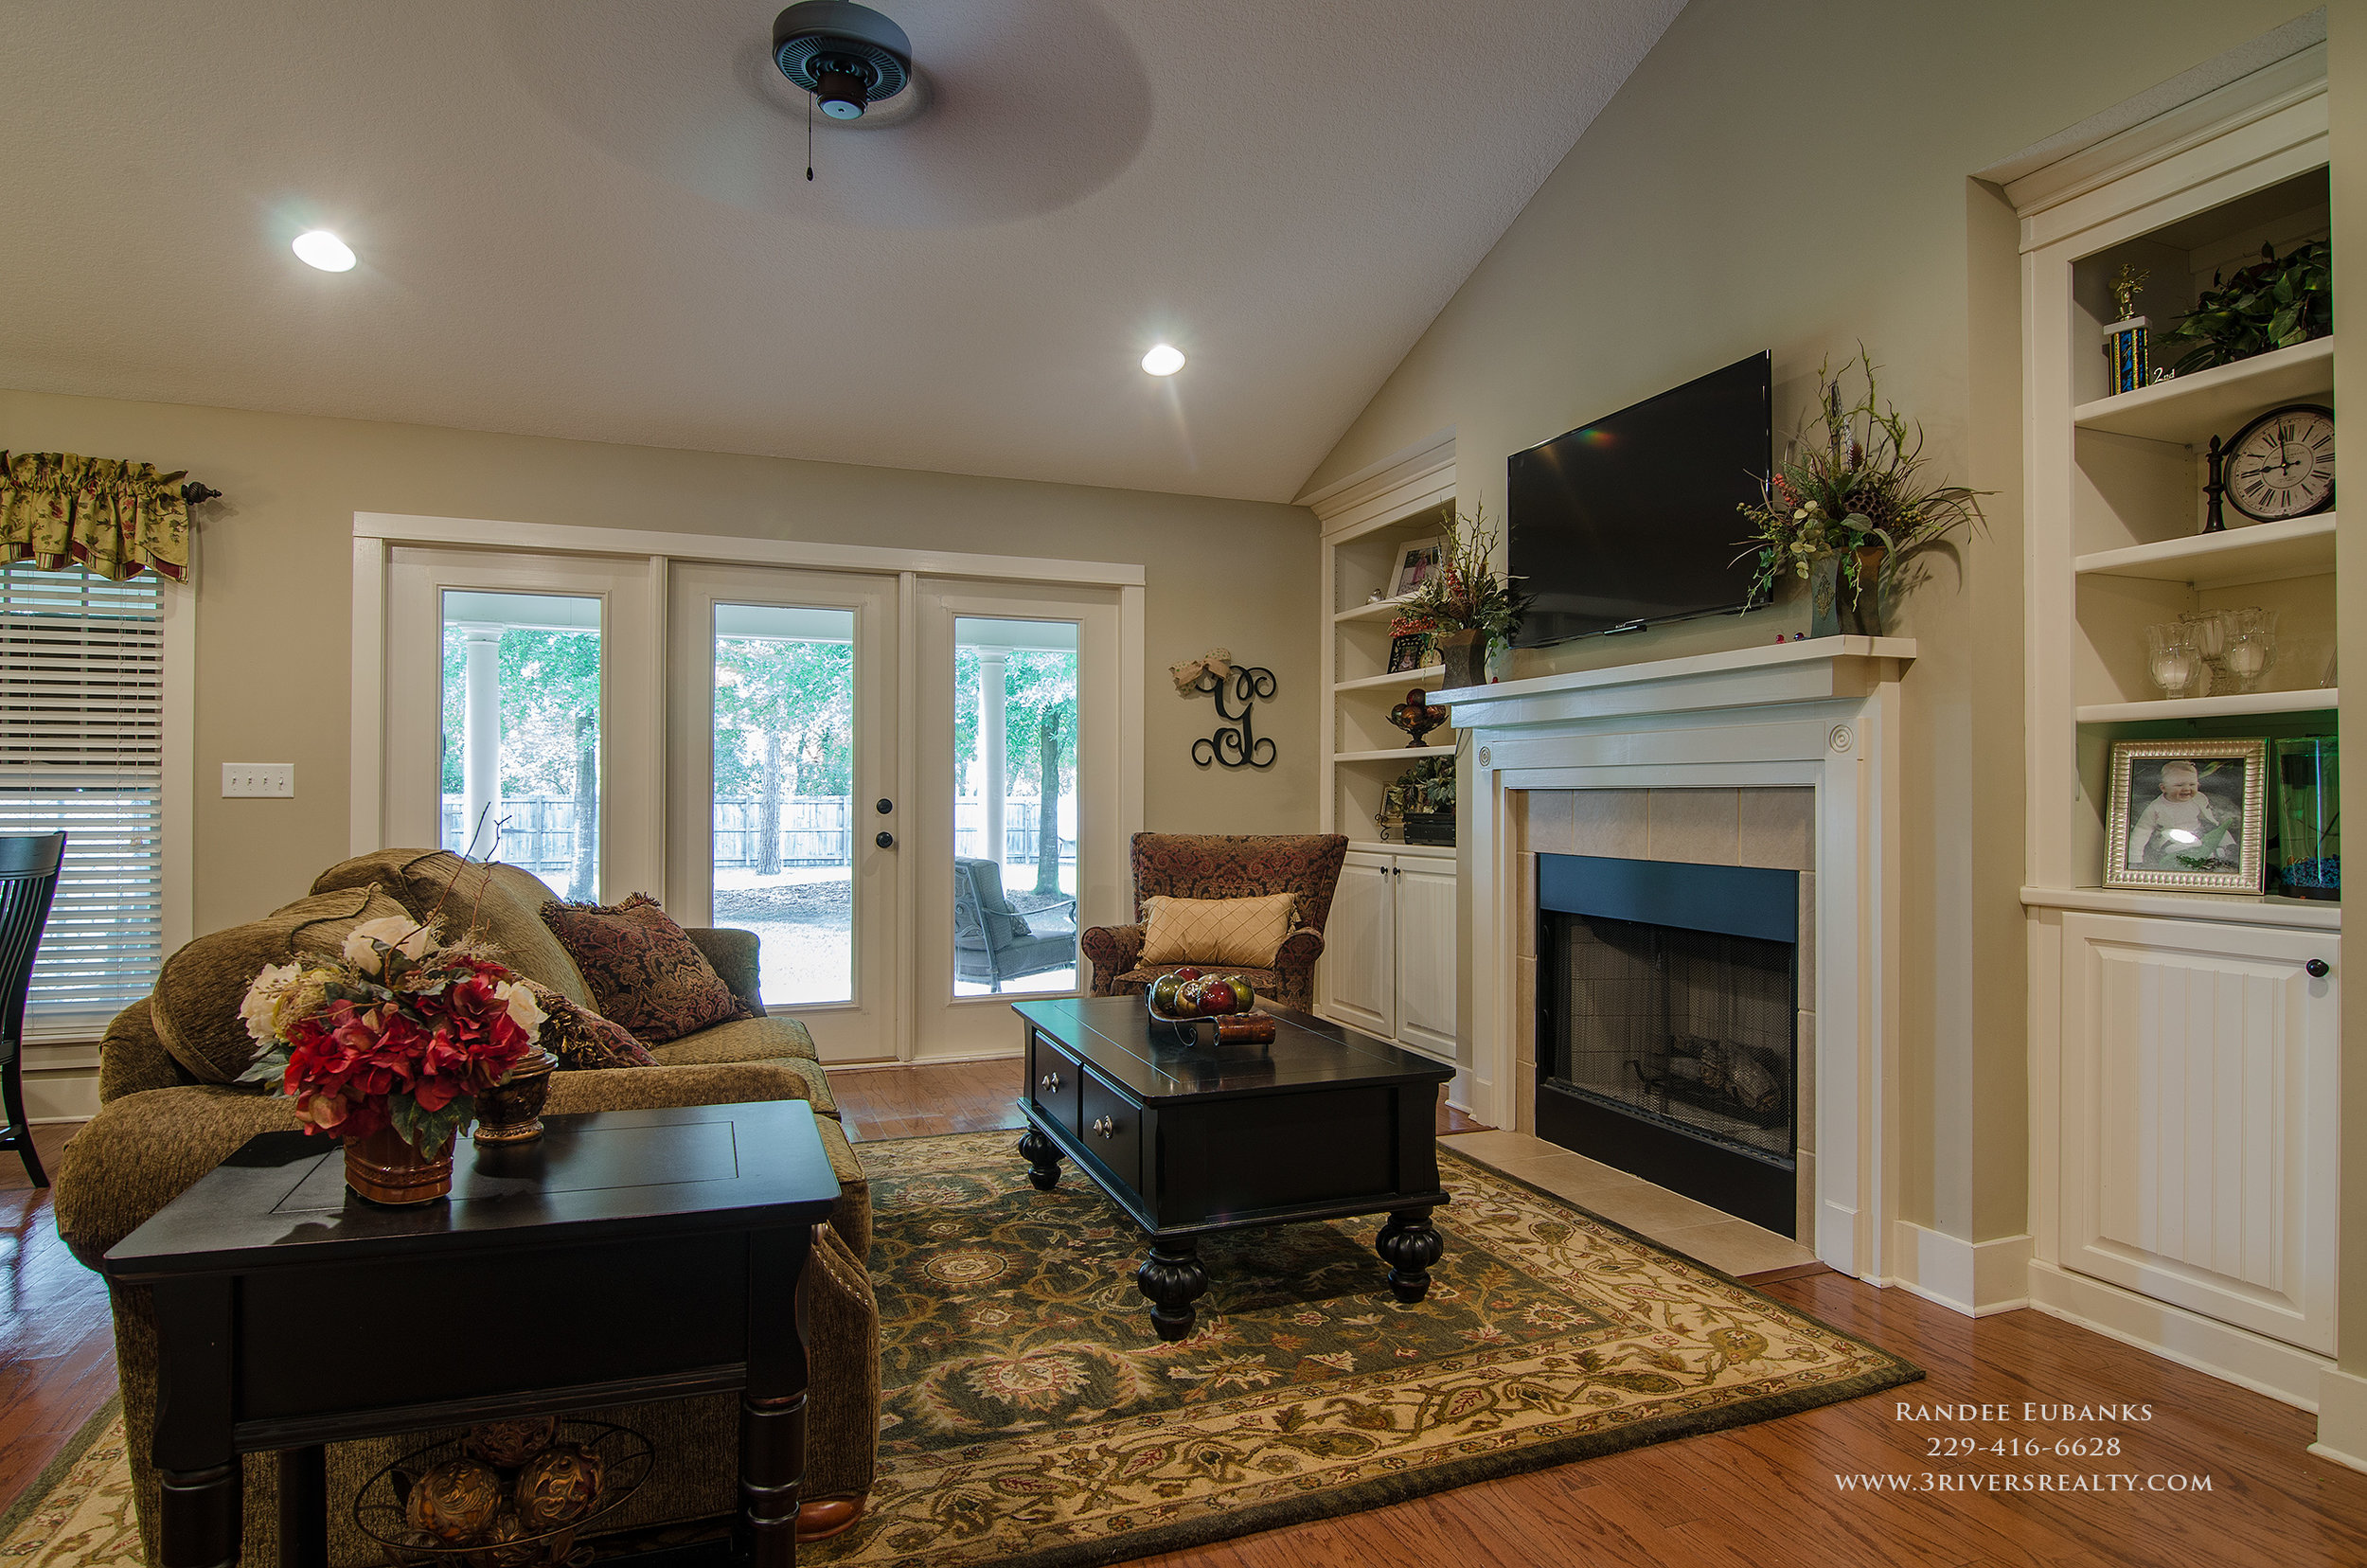 3riversrealty_bainbridge-georgia-home-for-sale_3-bed-2-bath_outdoor-fireplace_three-rivers-realty_mills-brock_TaurusUSA_pool_back-porch-fireplacae_livingroom.jpg